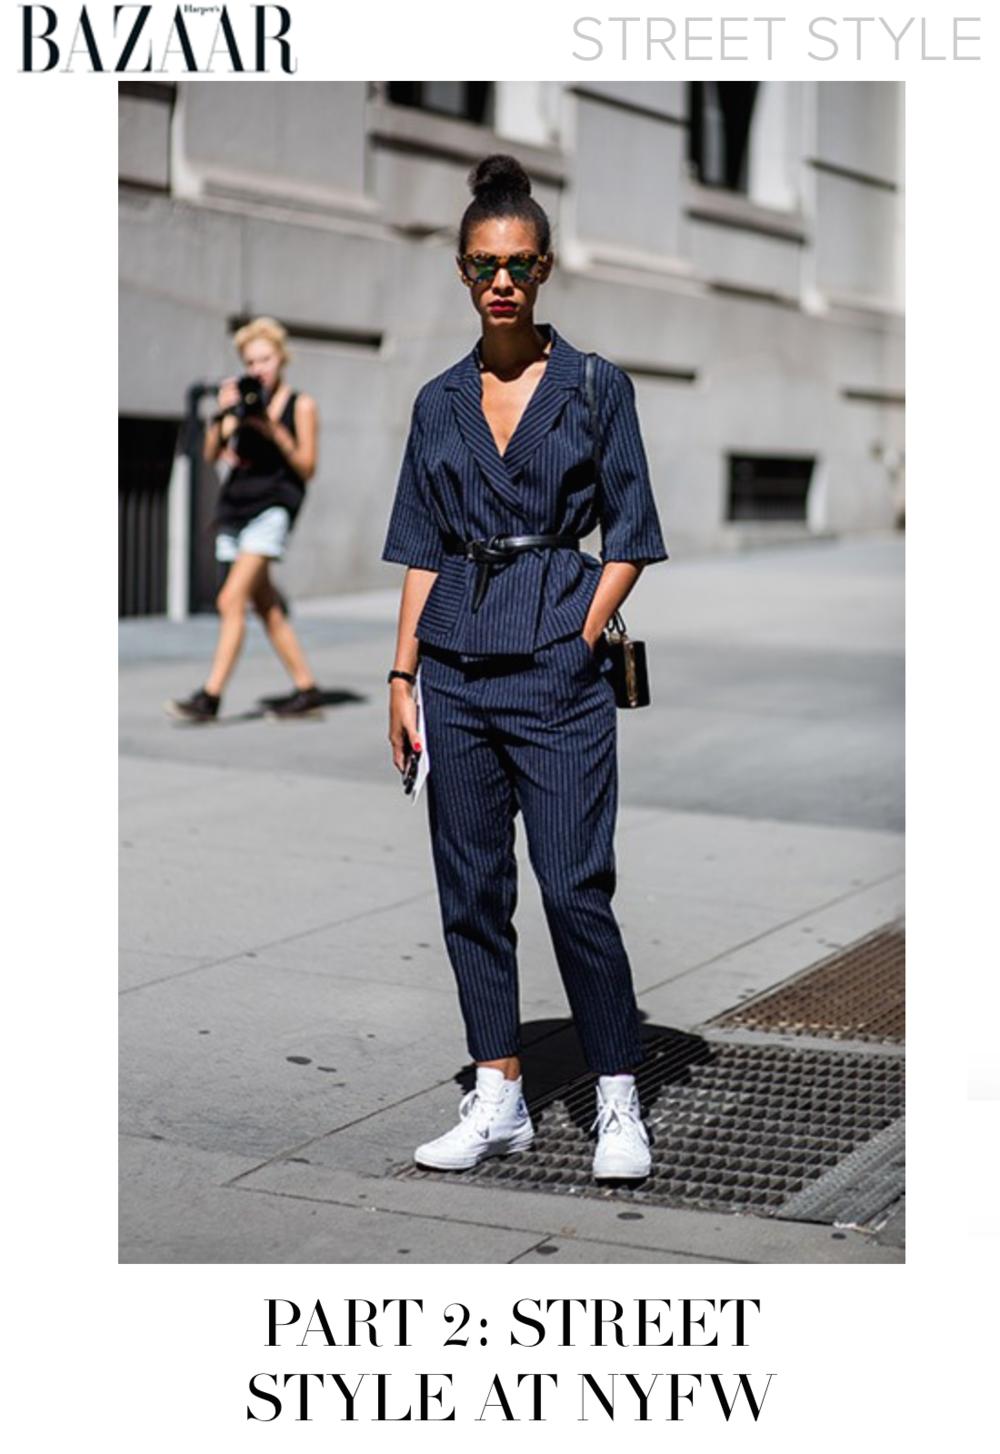 Claire Leana Millar Bazaar Street Style NYFW